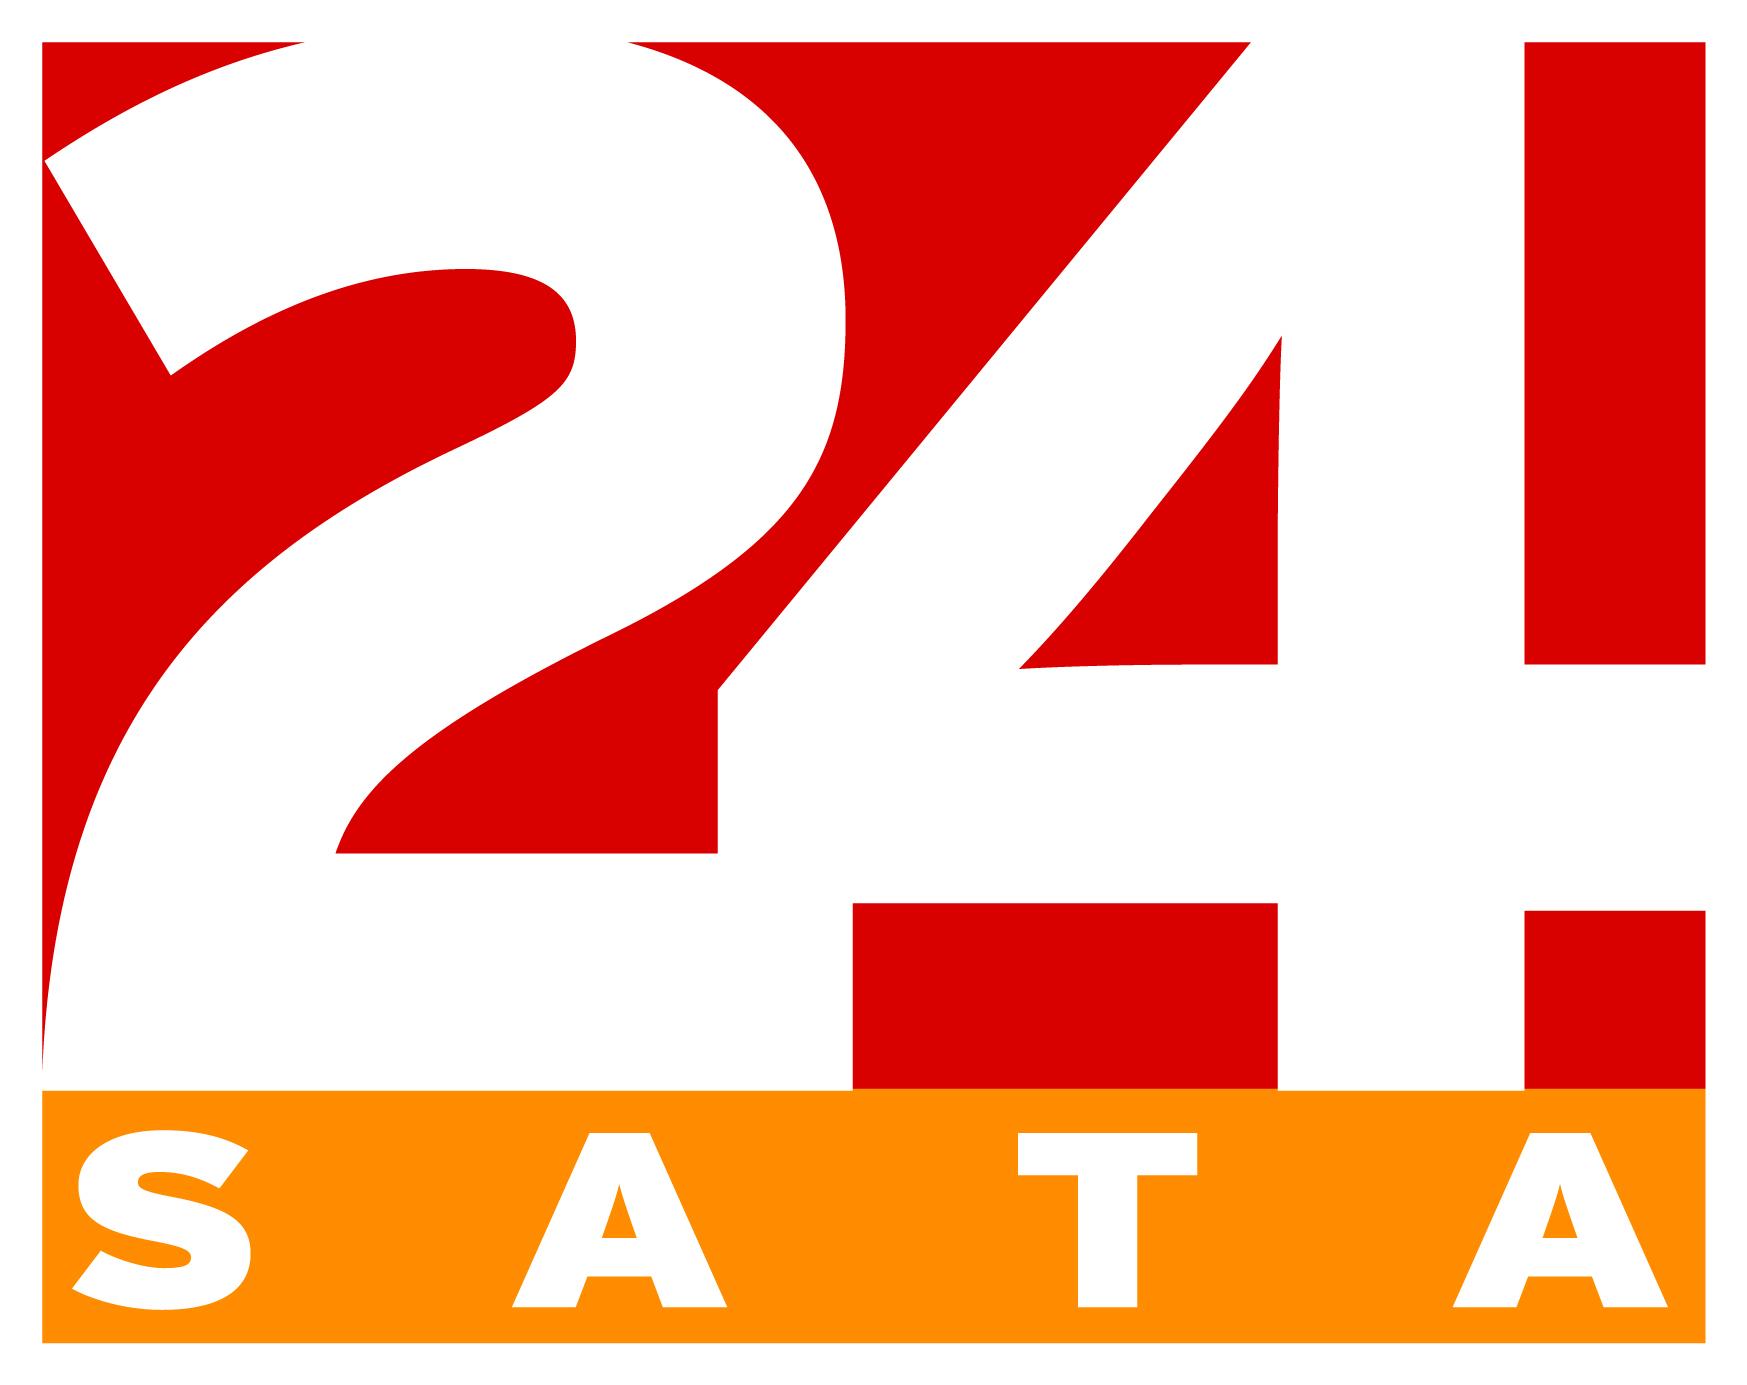 24sata RUB_LOGO_NOVO